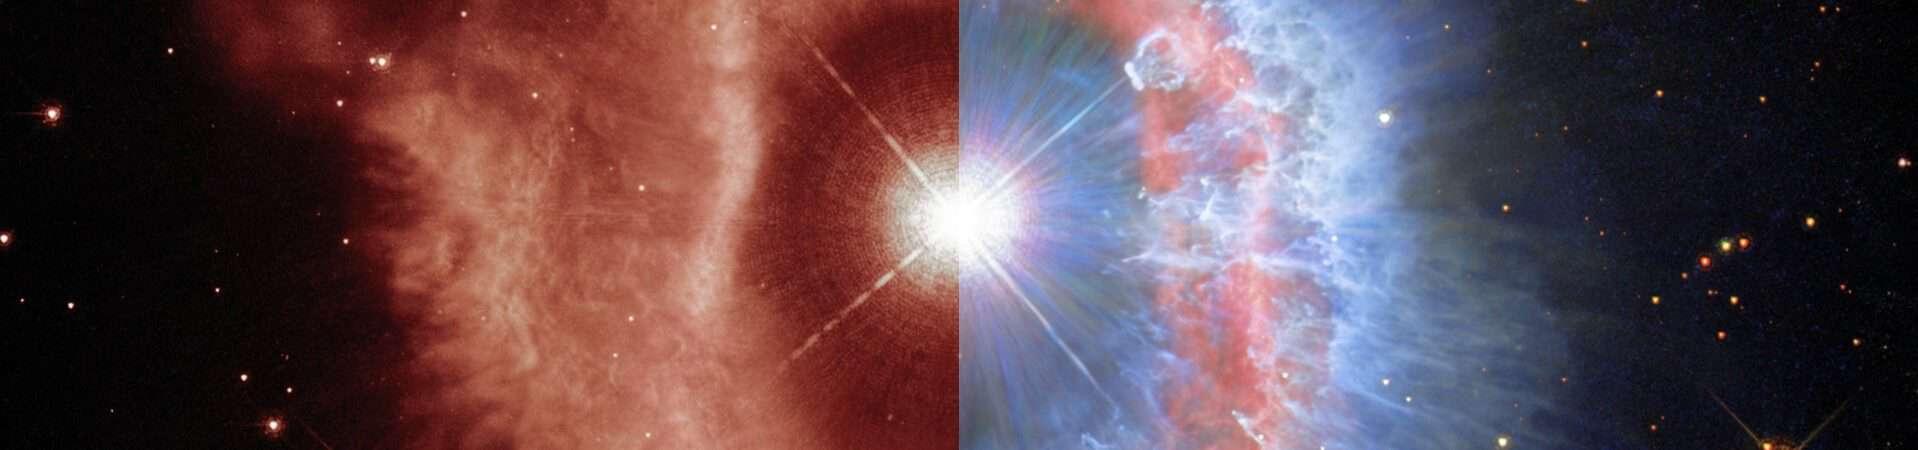 Estrela variável luminosa azul, AG Carinae como observada pelo telescópio espacial Hubble. Imagem: ESA/Hubble and NASA, A. Nota, C. Britt